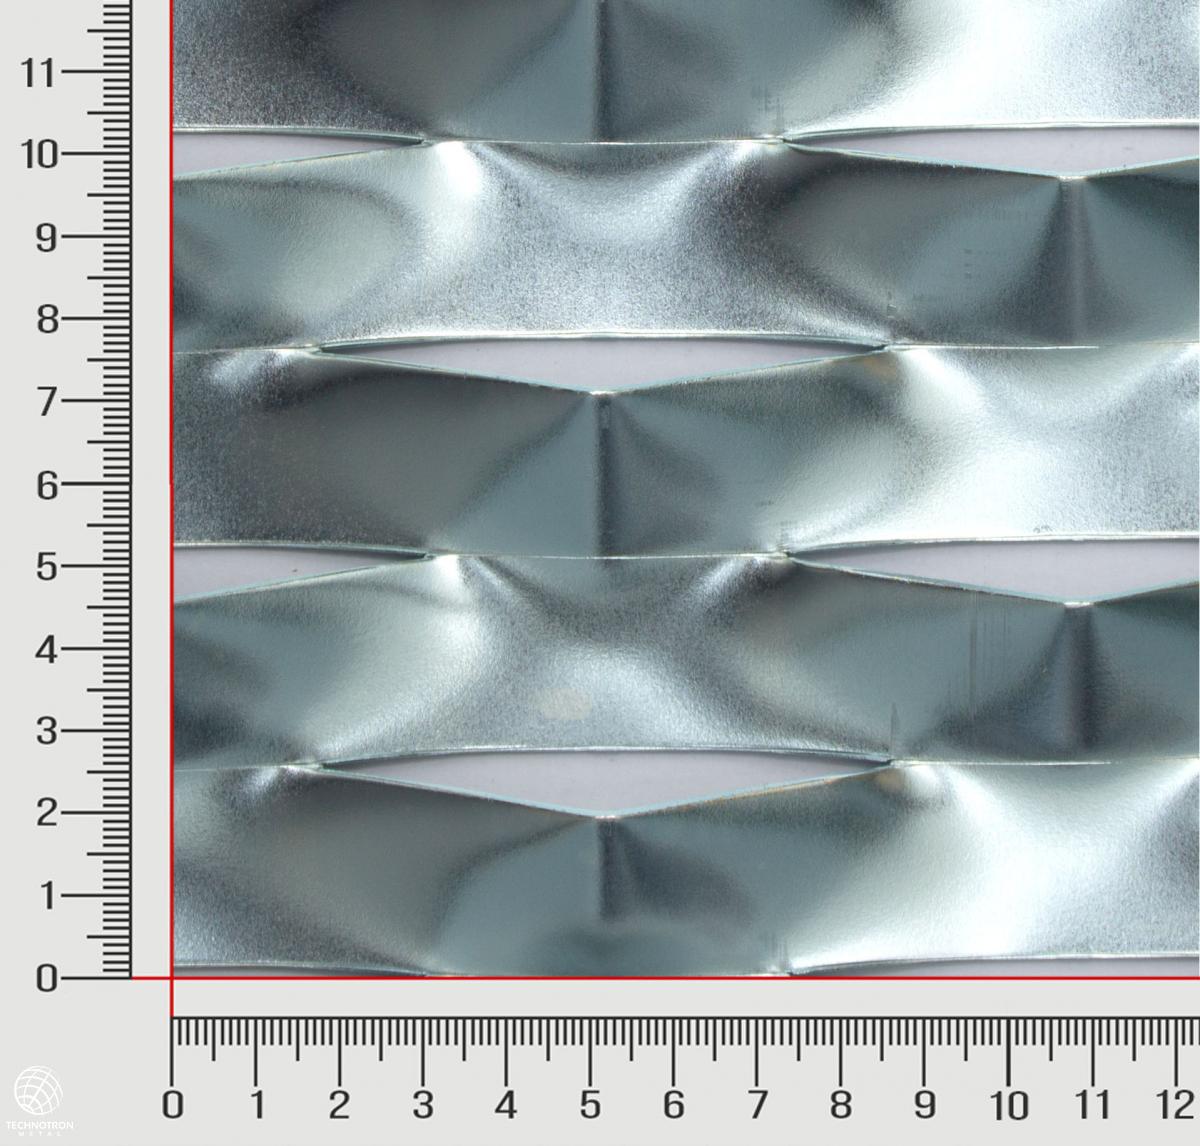 Plotová výplň Relax TR 115 x 52 x 24 mm; tloušťka 1,5 mm tahokov z ocelového plechu DC01-DC05